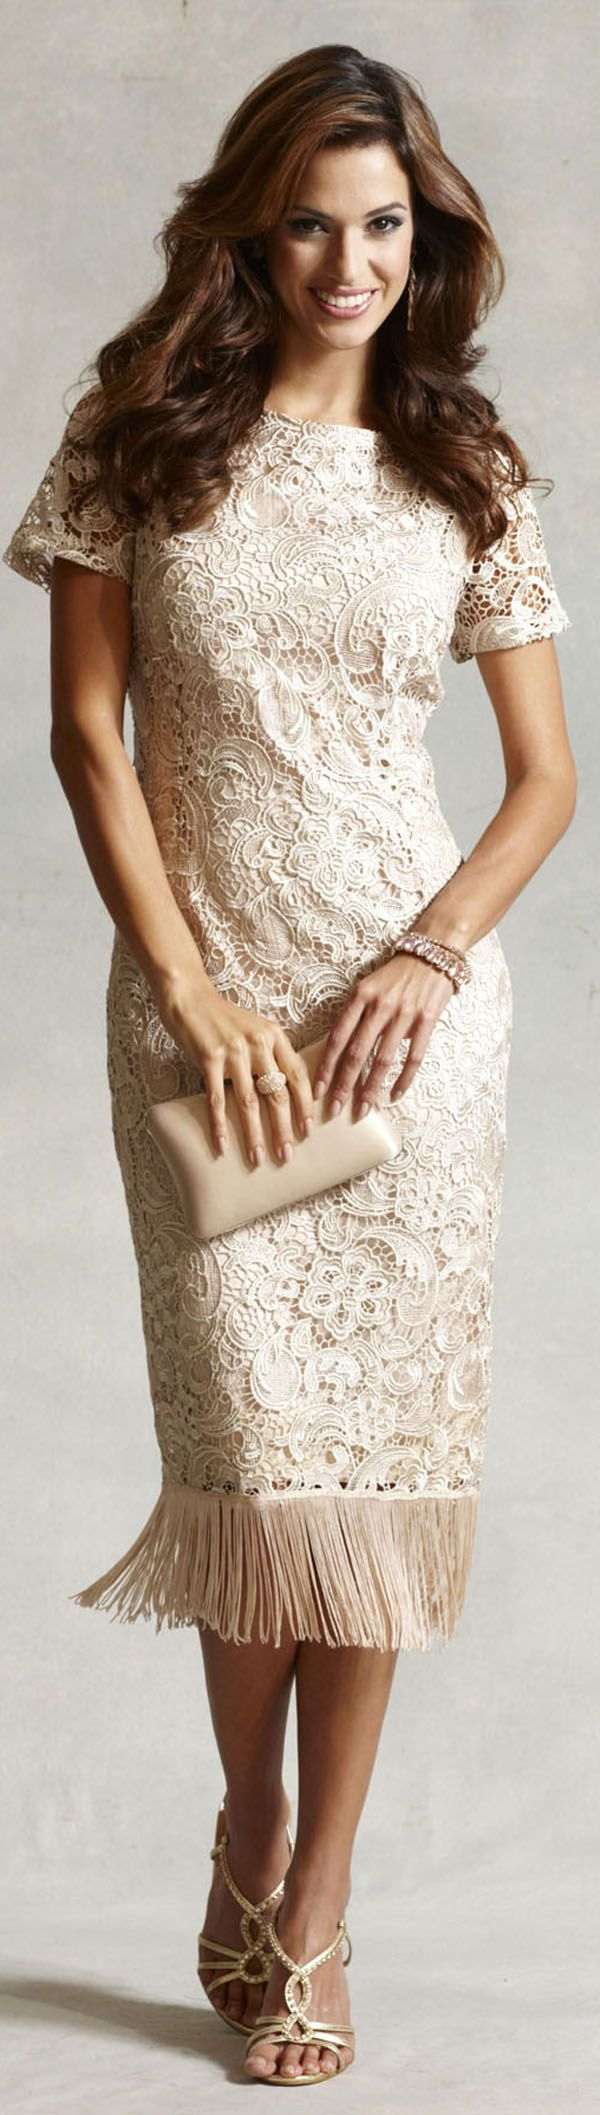 6 Vintage Hippie Wedding Dress Ideas for Your Second Marriage - http://boomerinas.com/2012/12/6-vintage-hippie-wedding-dress-ideas-for-your-second-marriage/